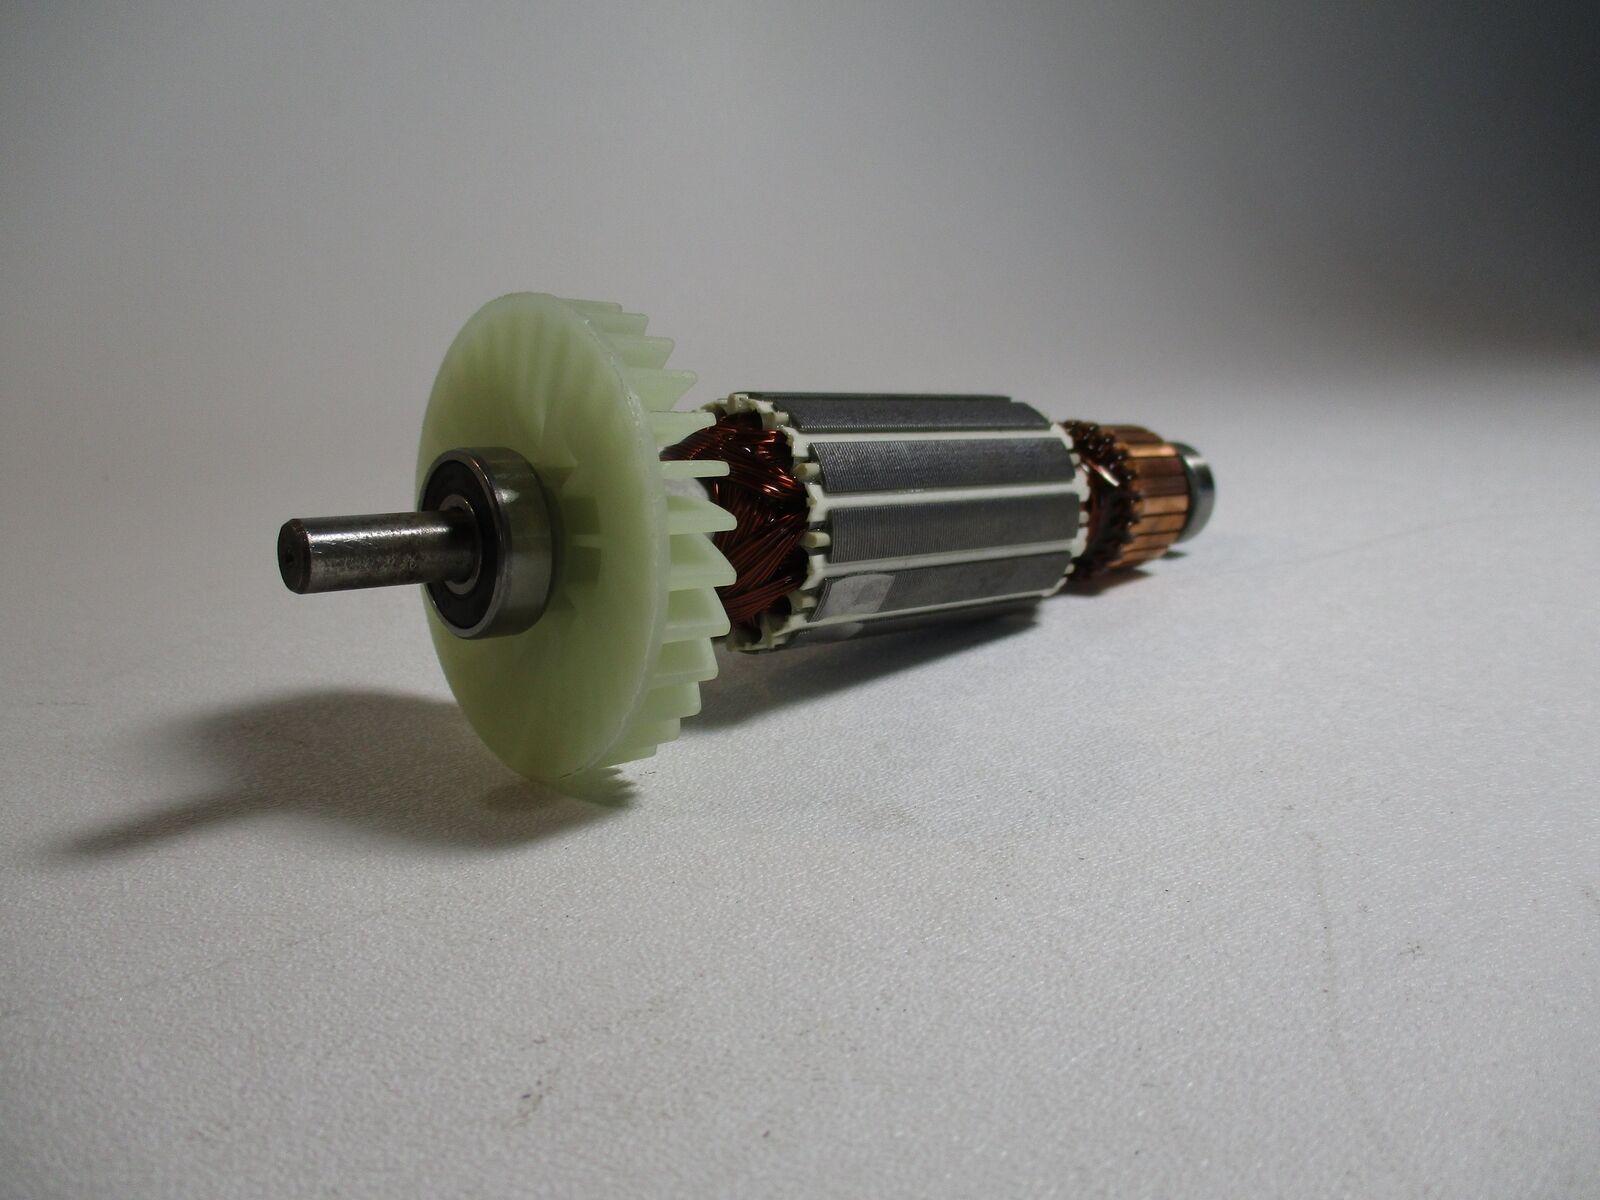 New Genuine OEM Ridgid Ryobi 039028001074 Armature Assembly Angle Grinder Replac